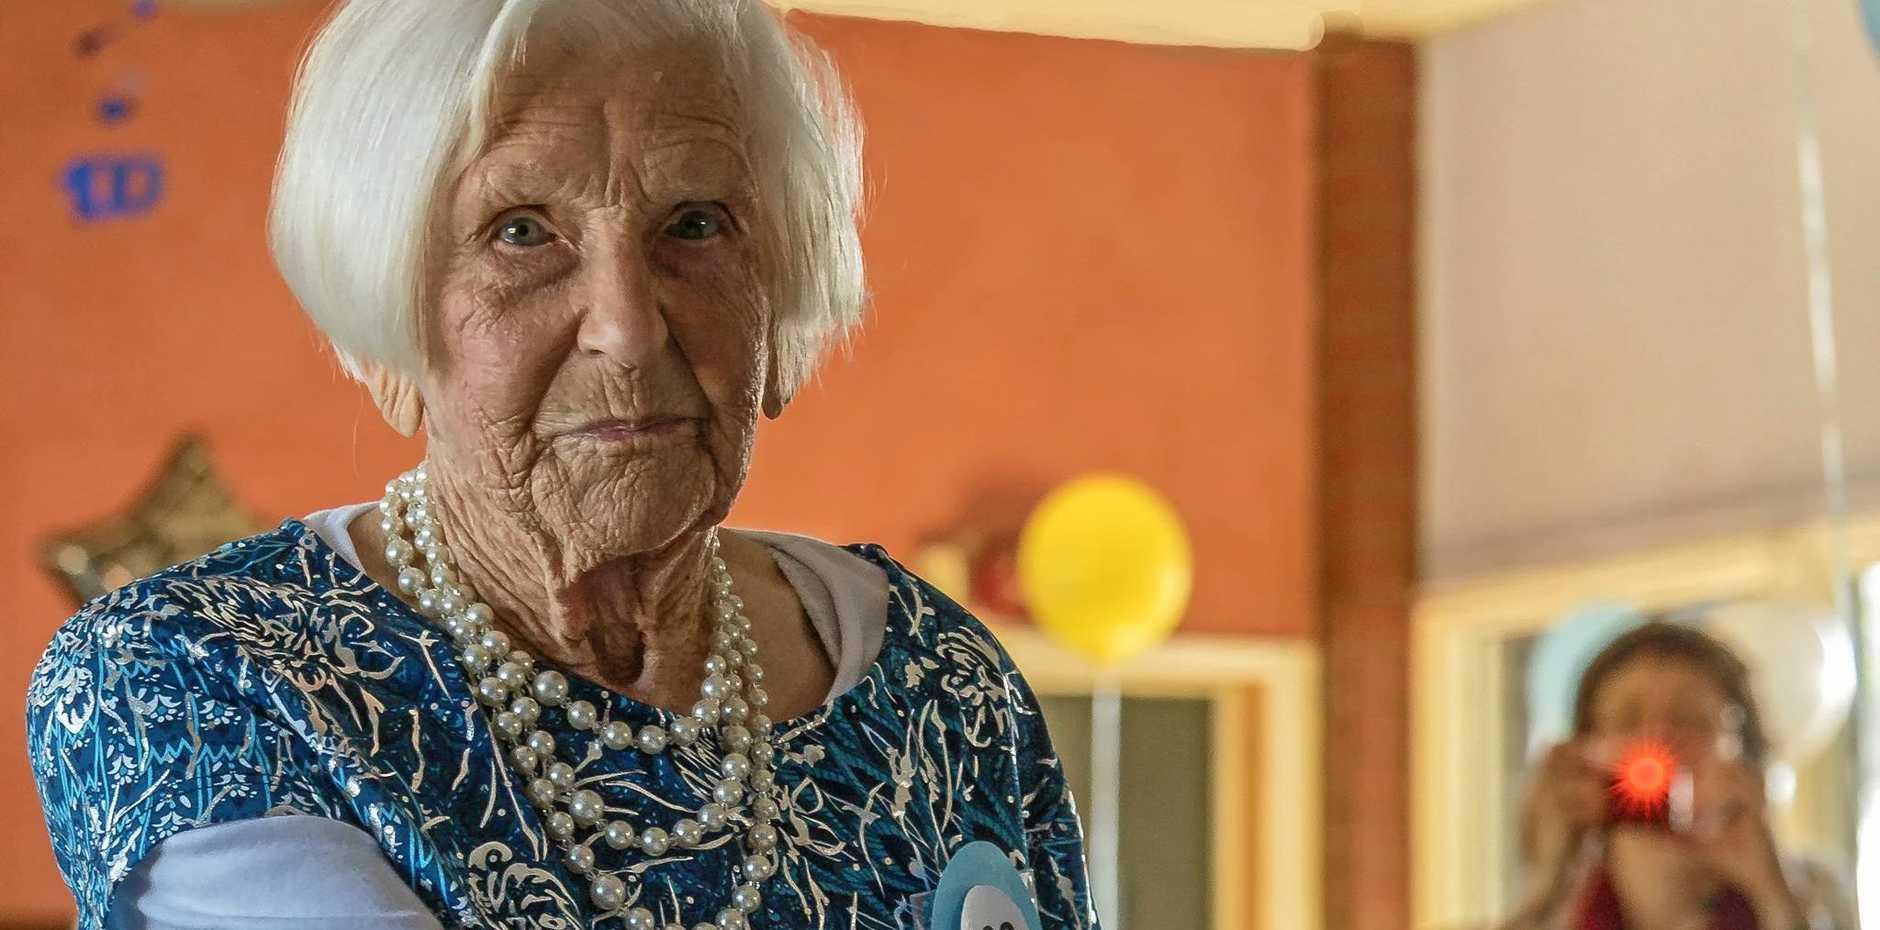 BUDERIM LEGEND: Buderim State School's oldest living pupil turns 100.